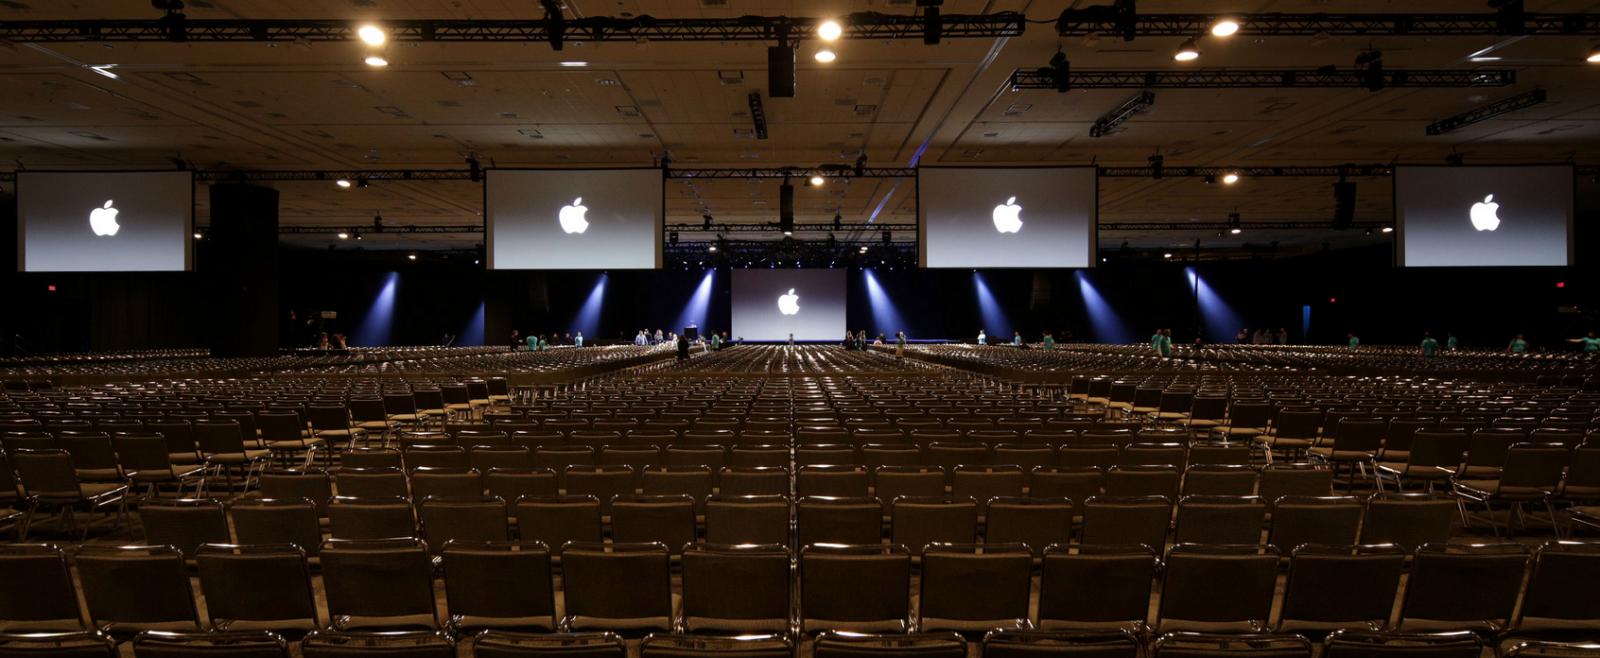 Apple WWDC 2015 Live blog